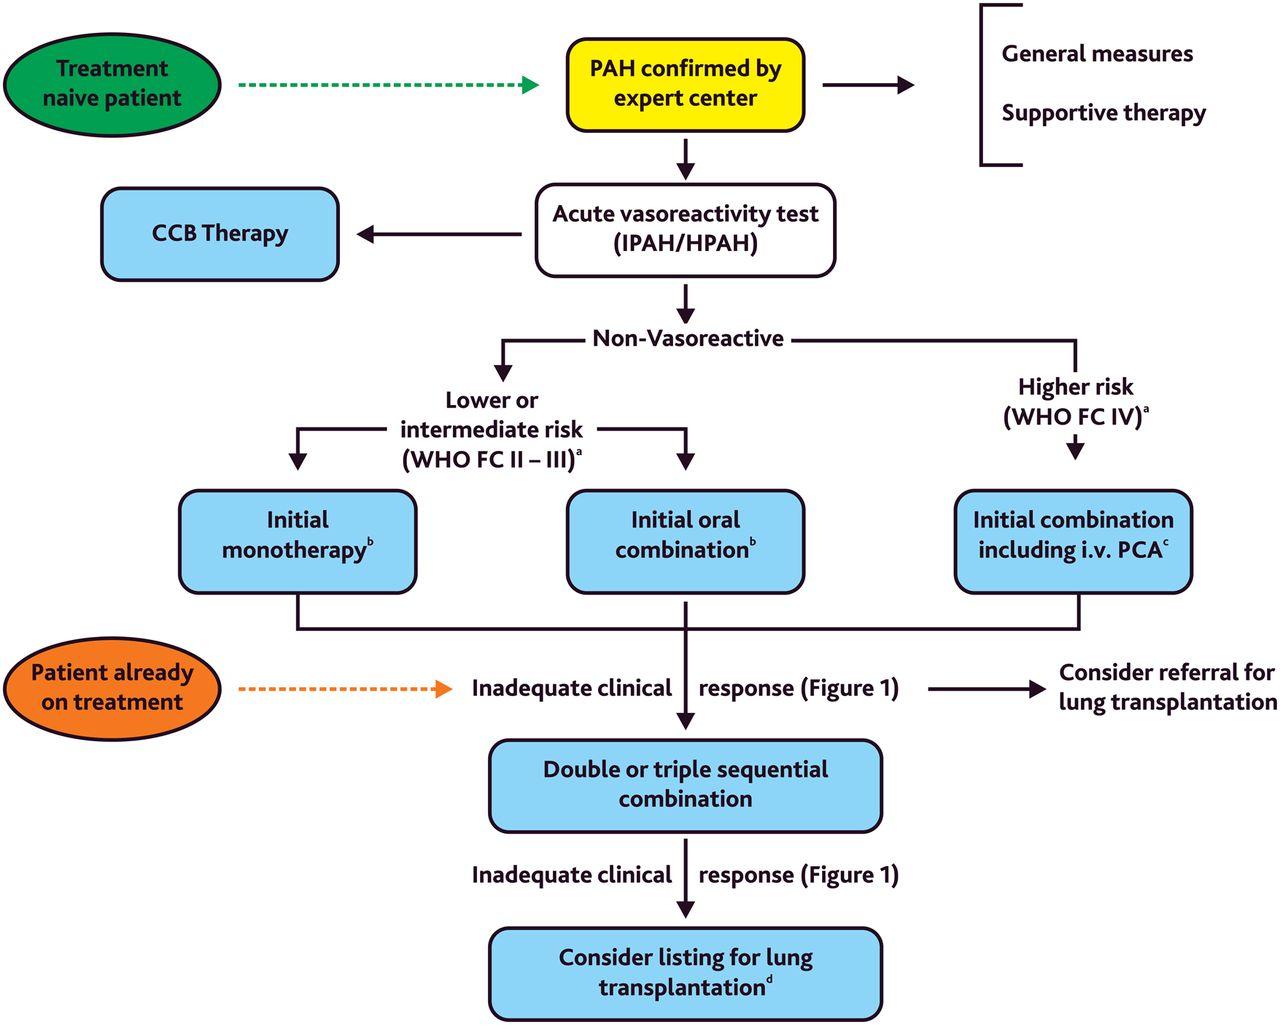 Treatment Of Children With Pulmonary Hypertension Expert